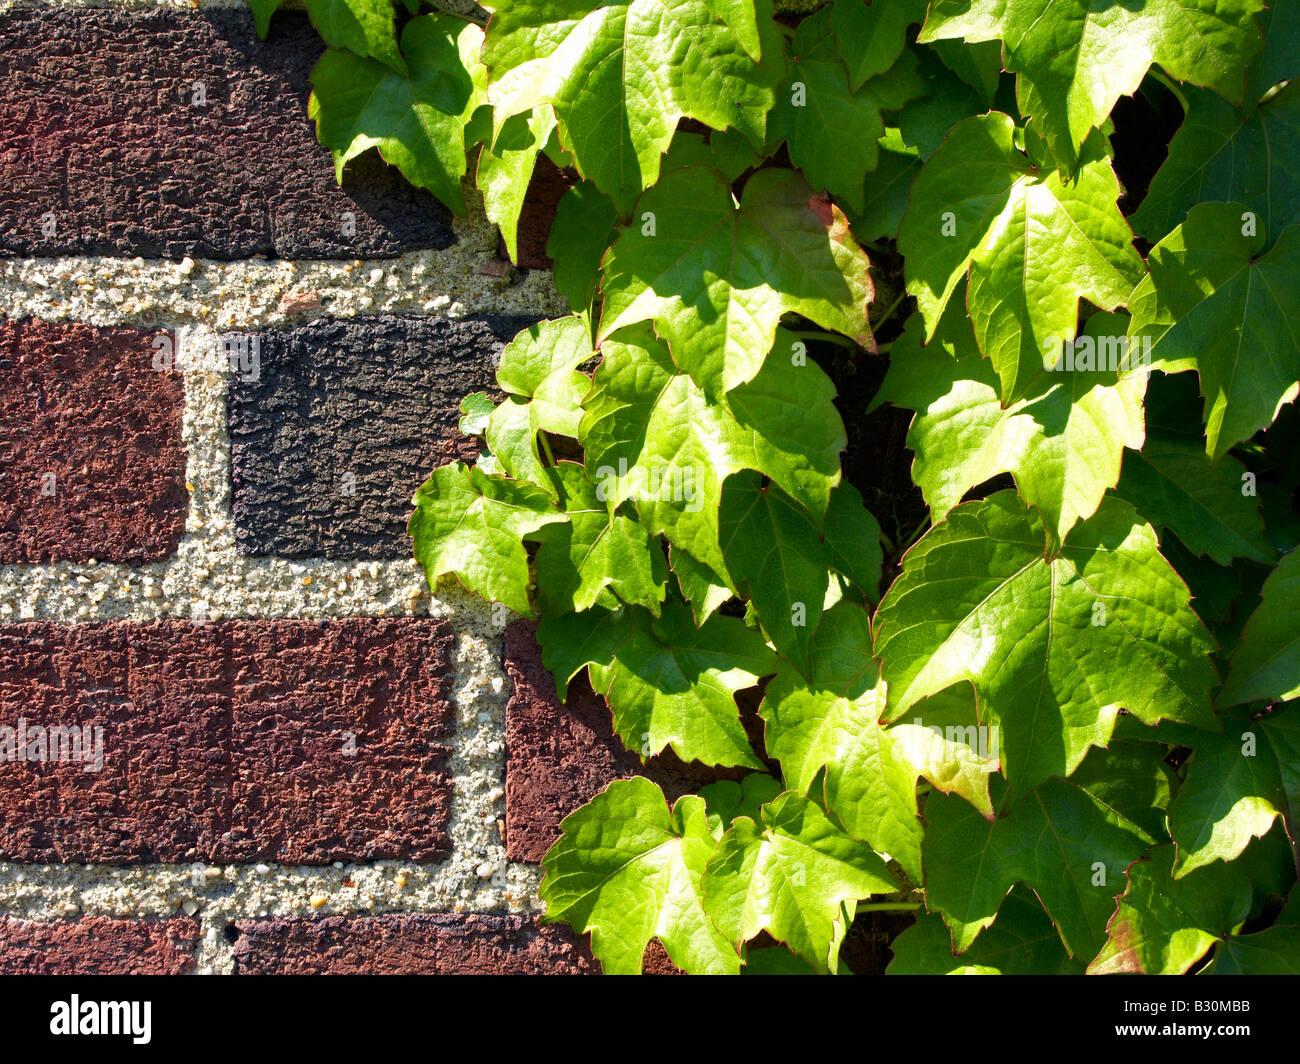 Ivy on brick wall close up - Stock Image